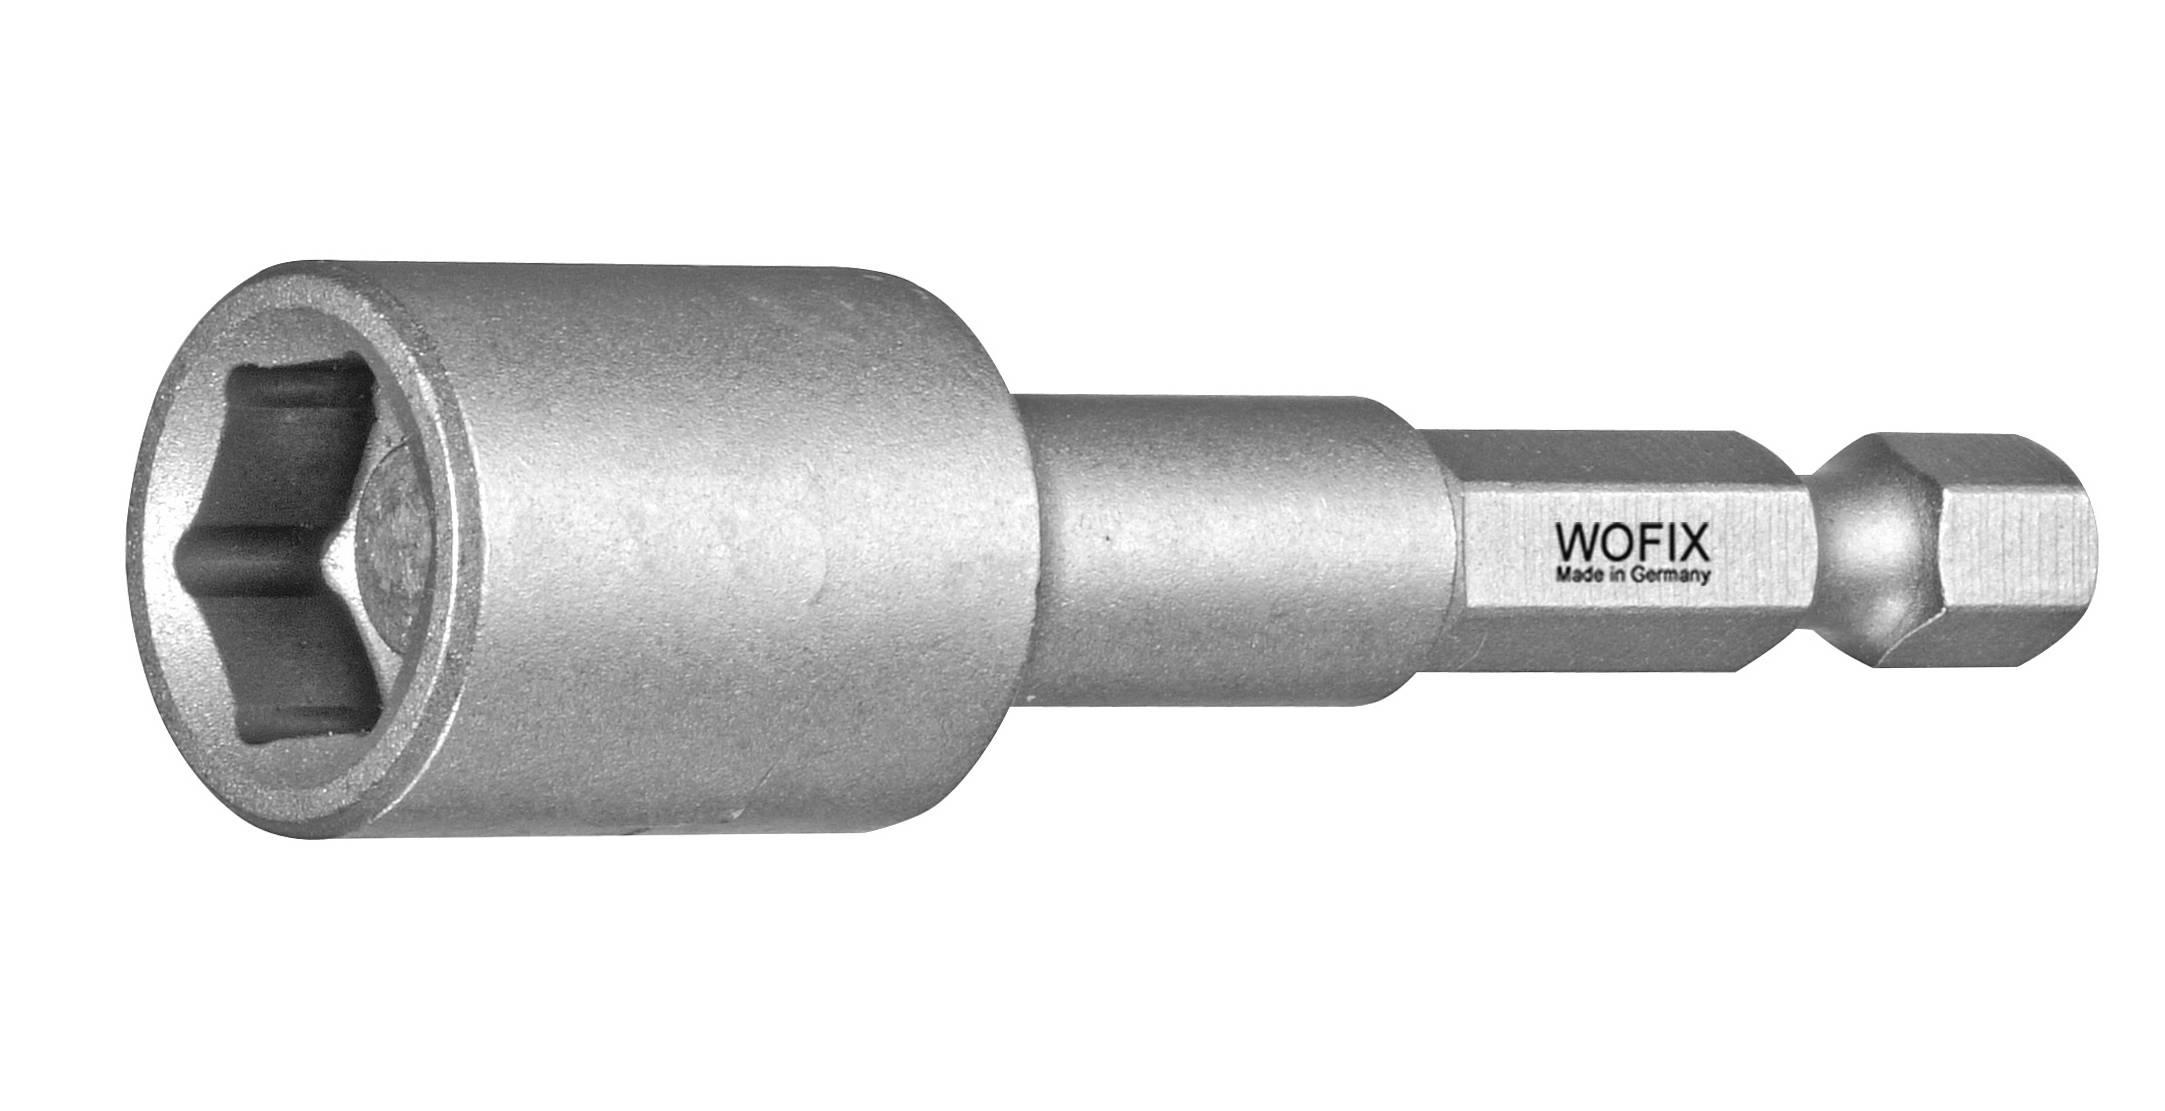 Wofix 7358140 Professional standard Dopbit - SW1/4 50 mm